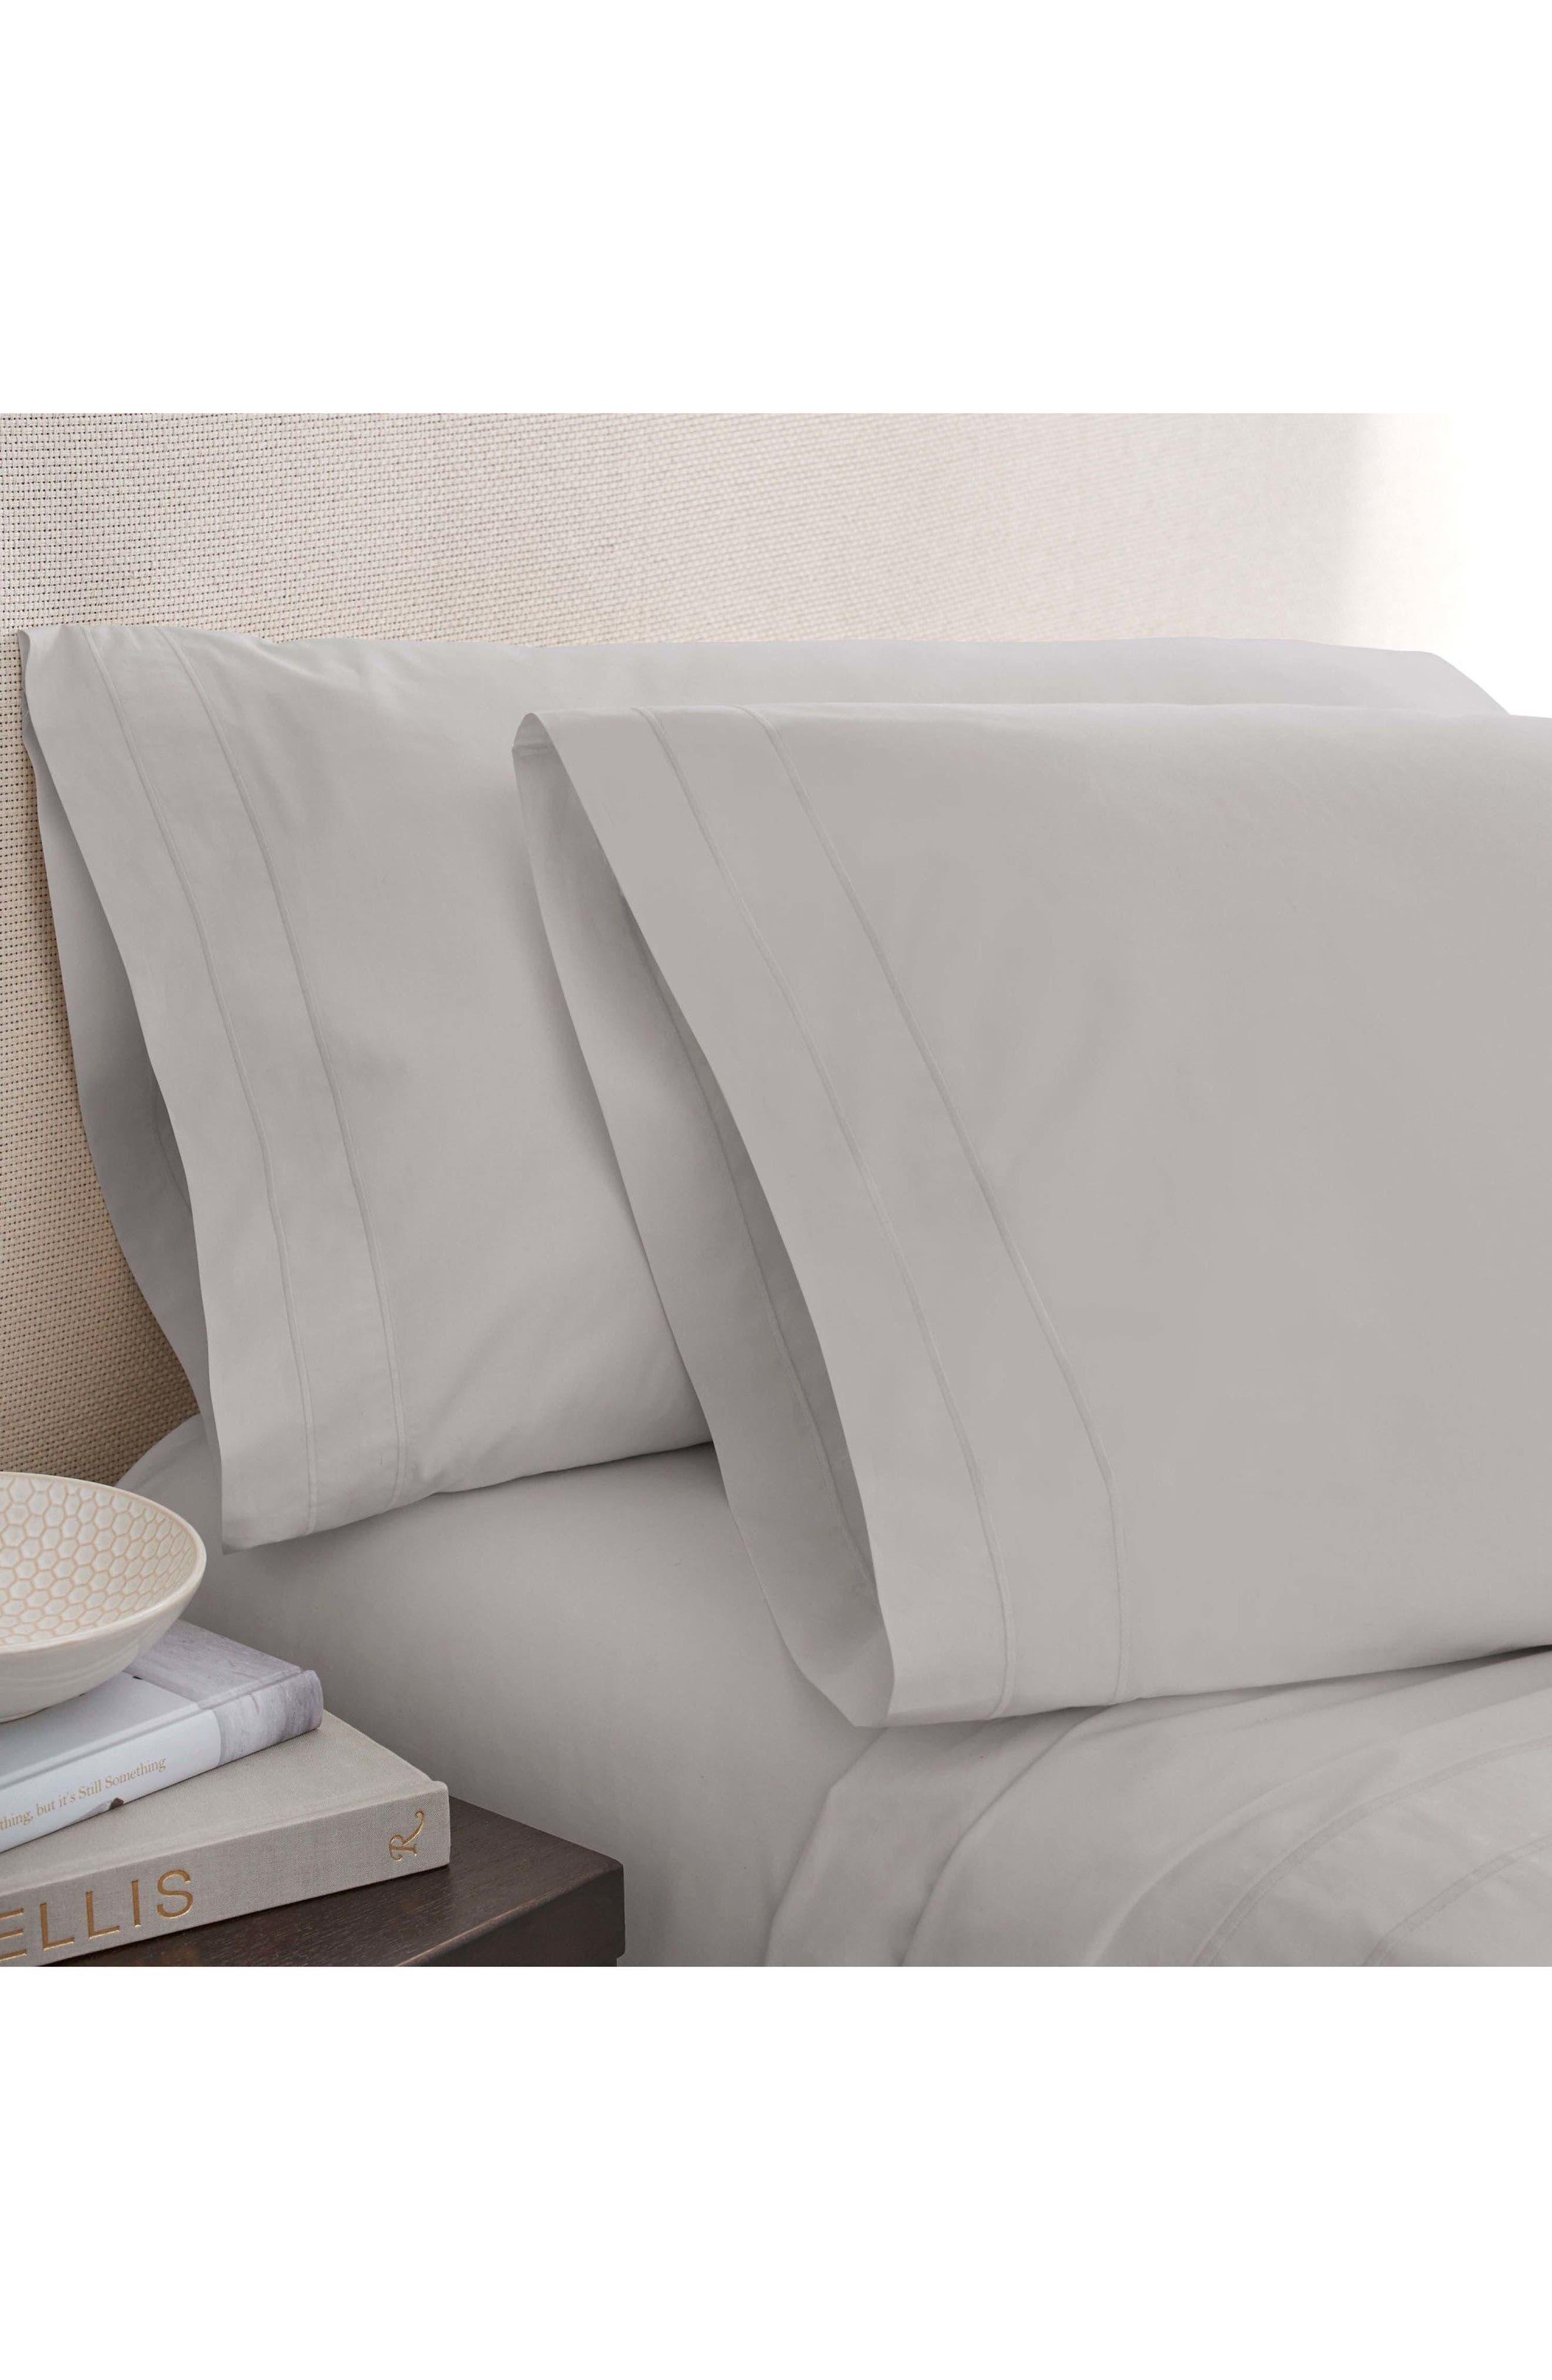 Main Image - Portico The Denizen Organic Cotton Pillowcases